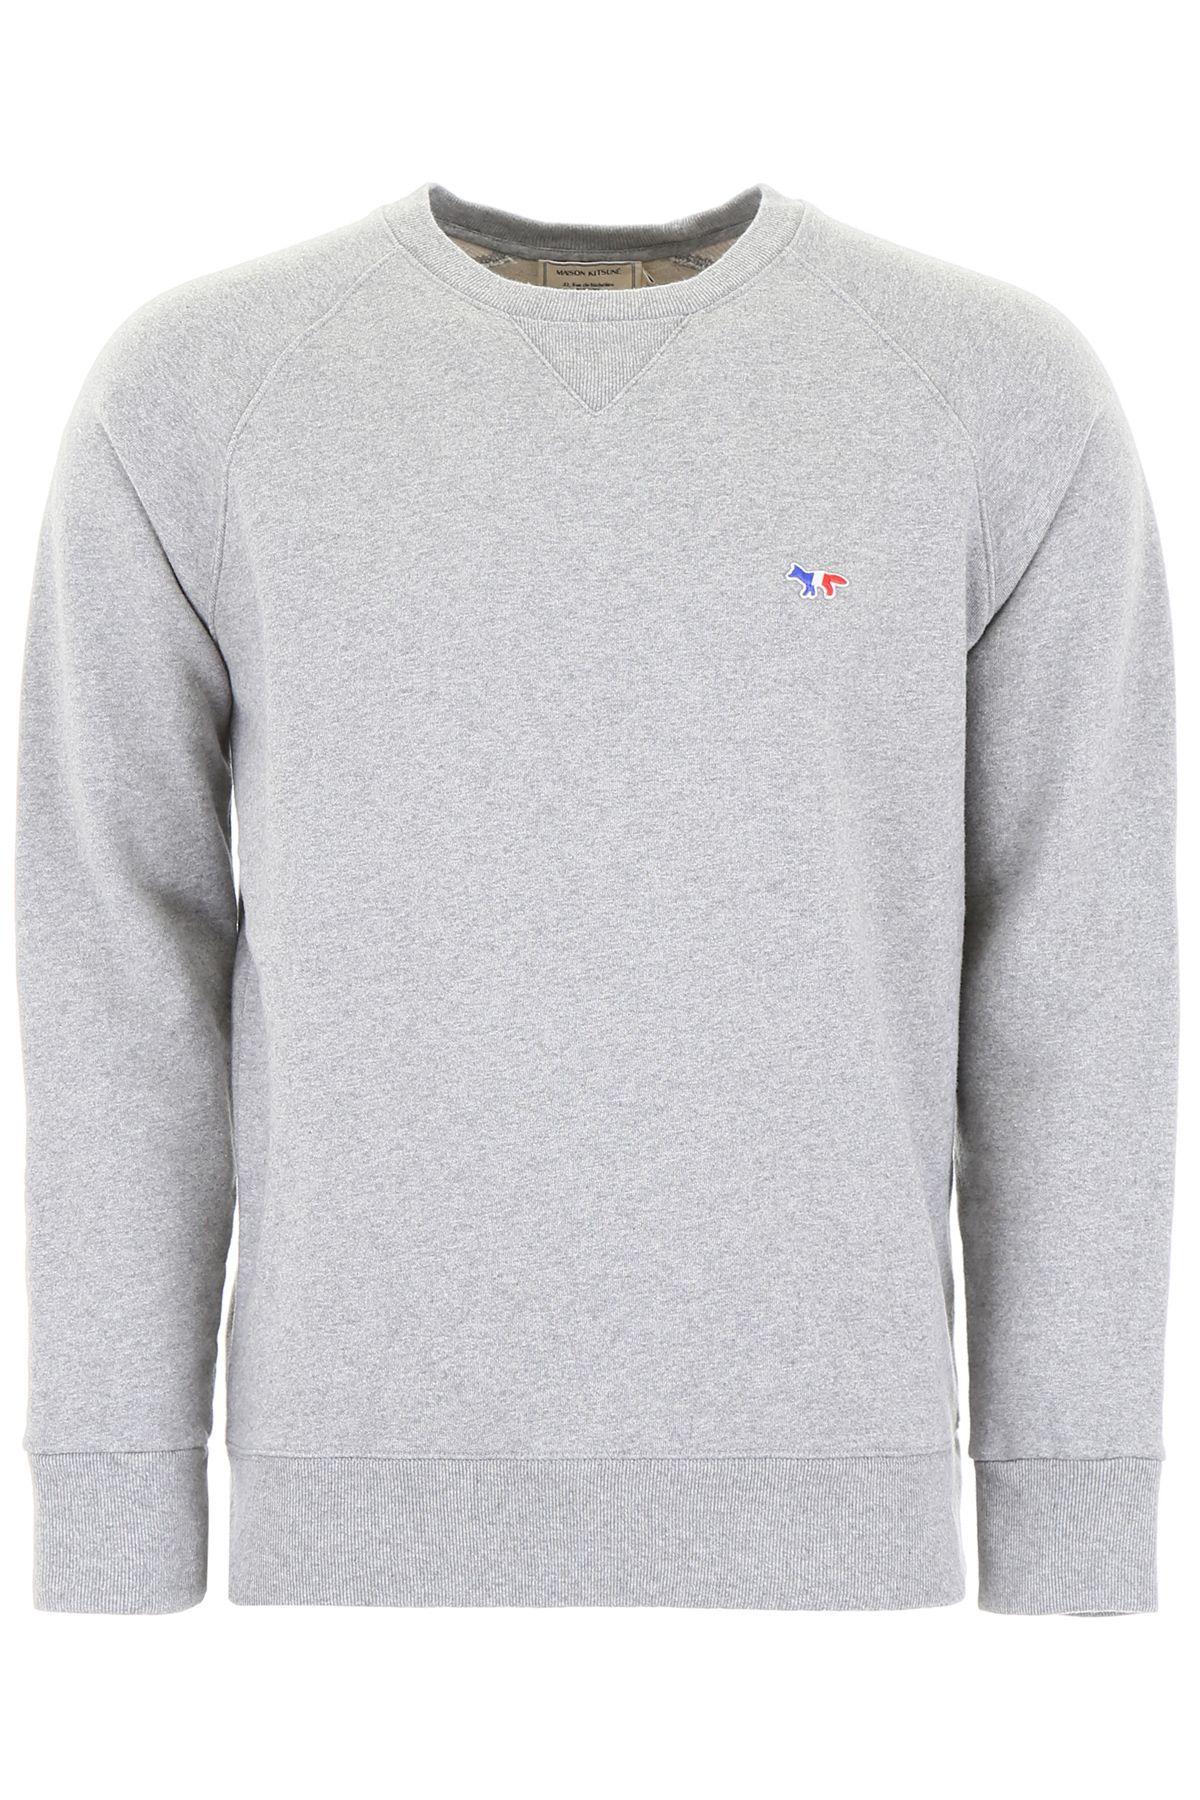 Maison Kitsune Tricolor Fox Sweatshirt In Grey Melange Grigio Modesens Sweatshirts Maison Kitsune Kitsune [ 1800 x 1200 Pixel ]